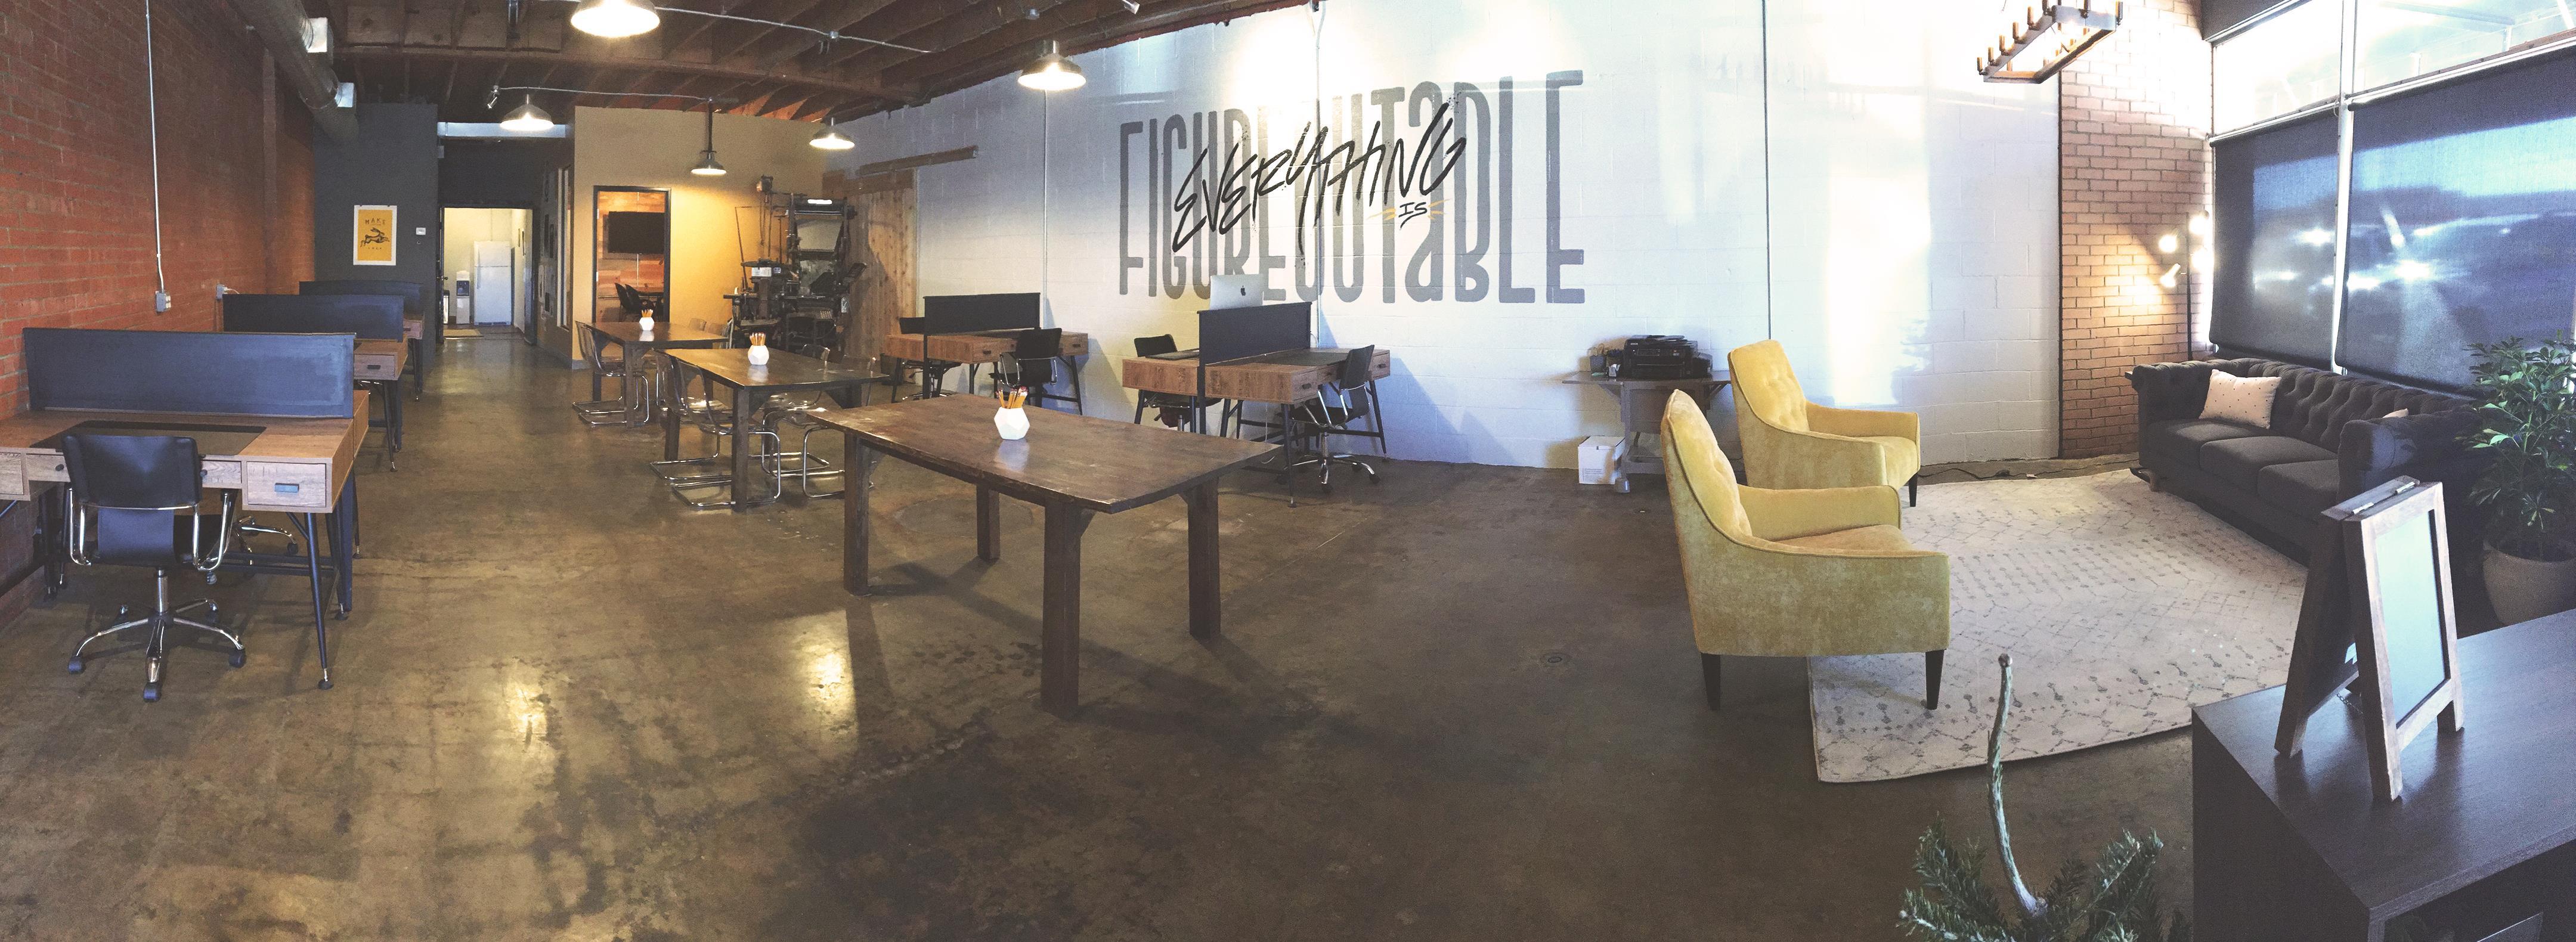 The Union Hall Workspace - Flex Space